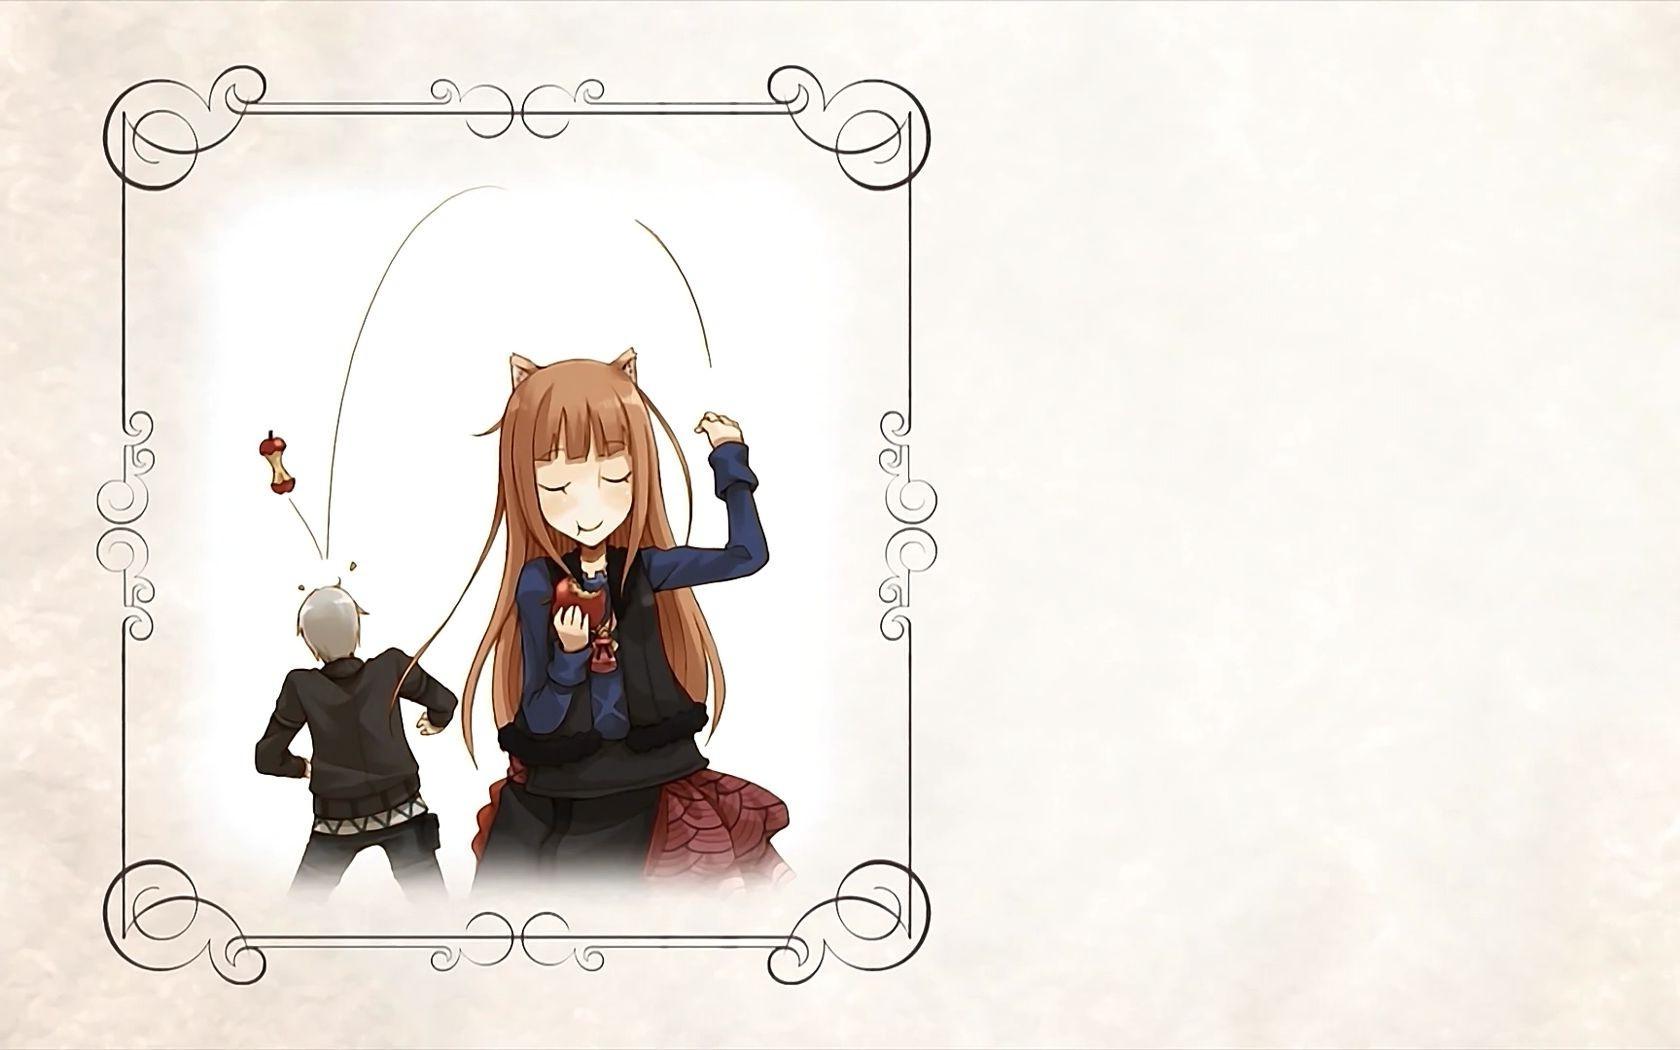 Wallpaper Ilustrasi Anime Gambar Kartun Apel Holo